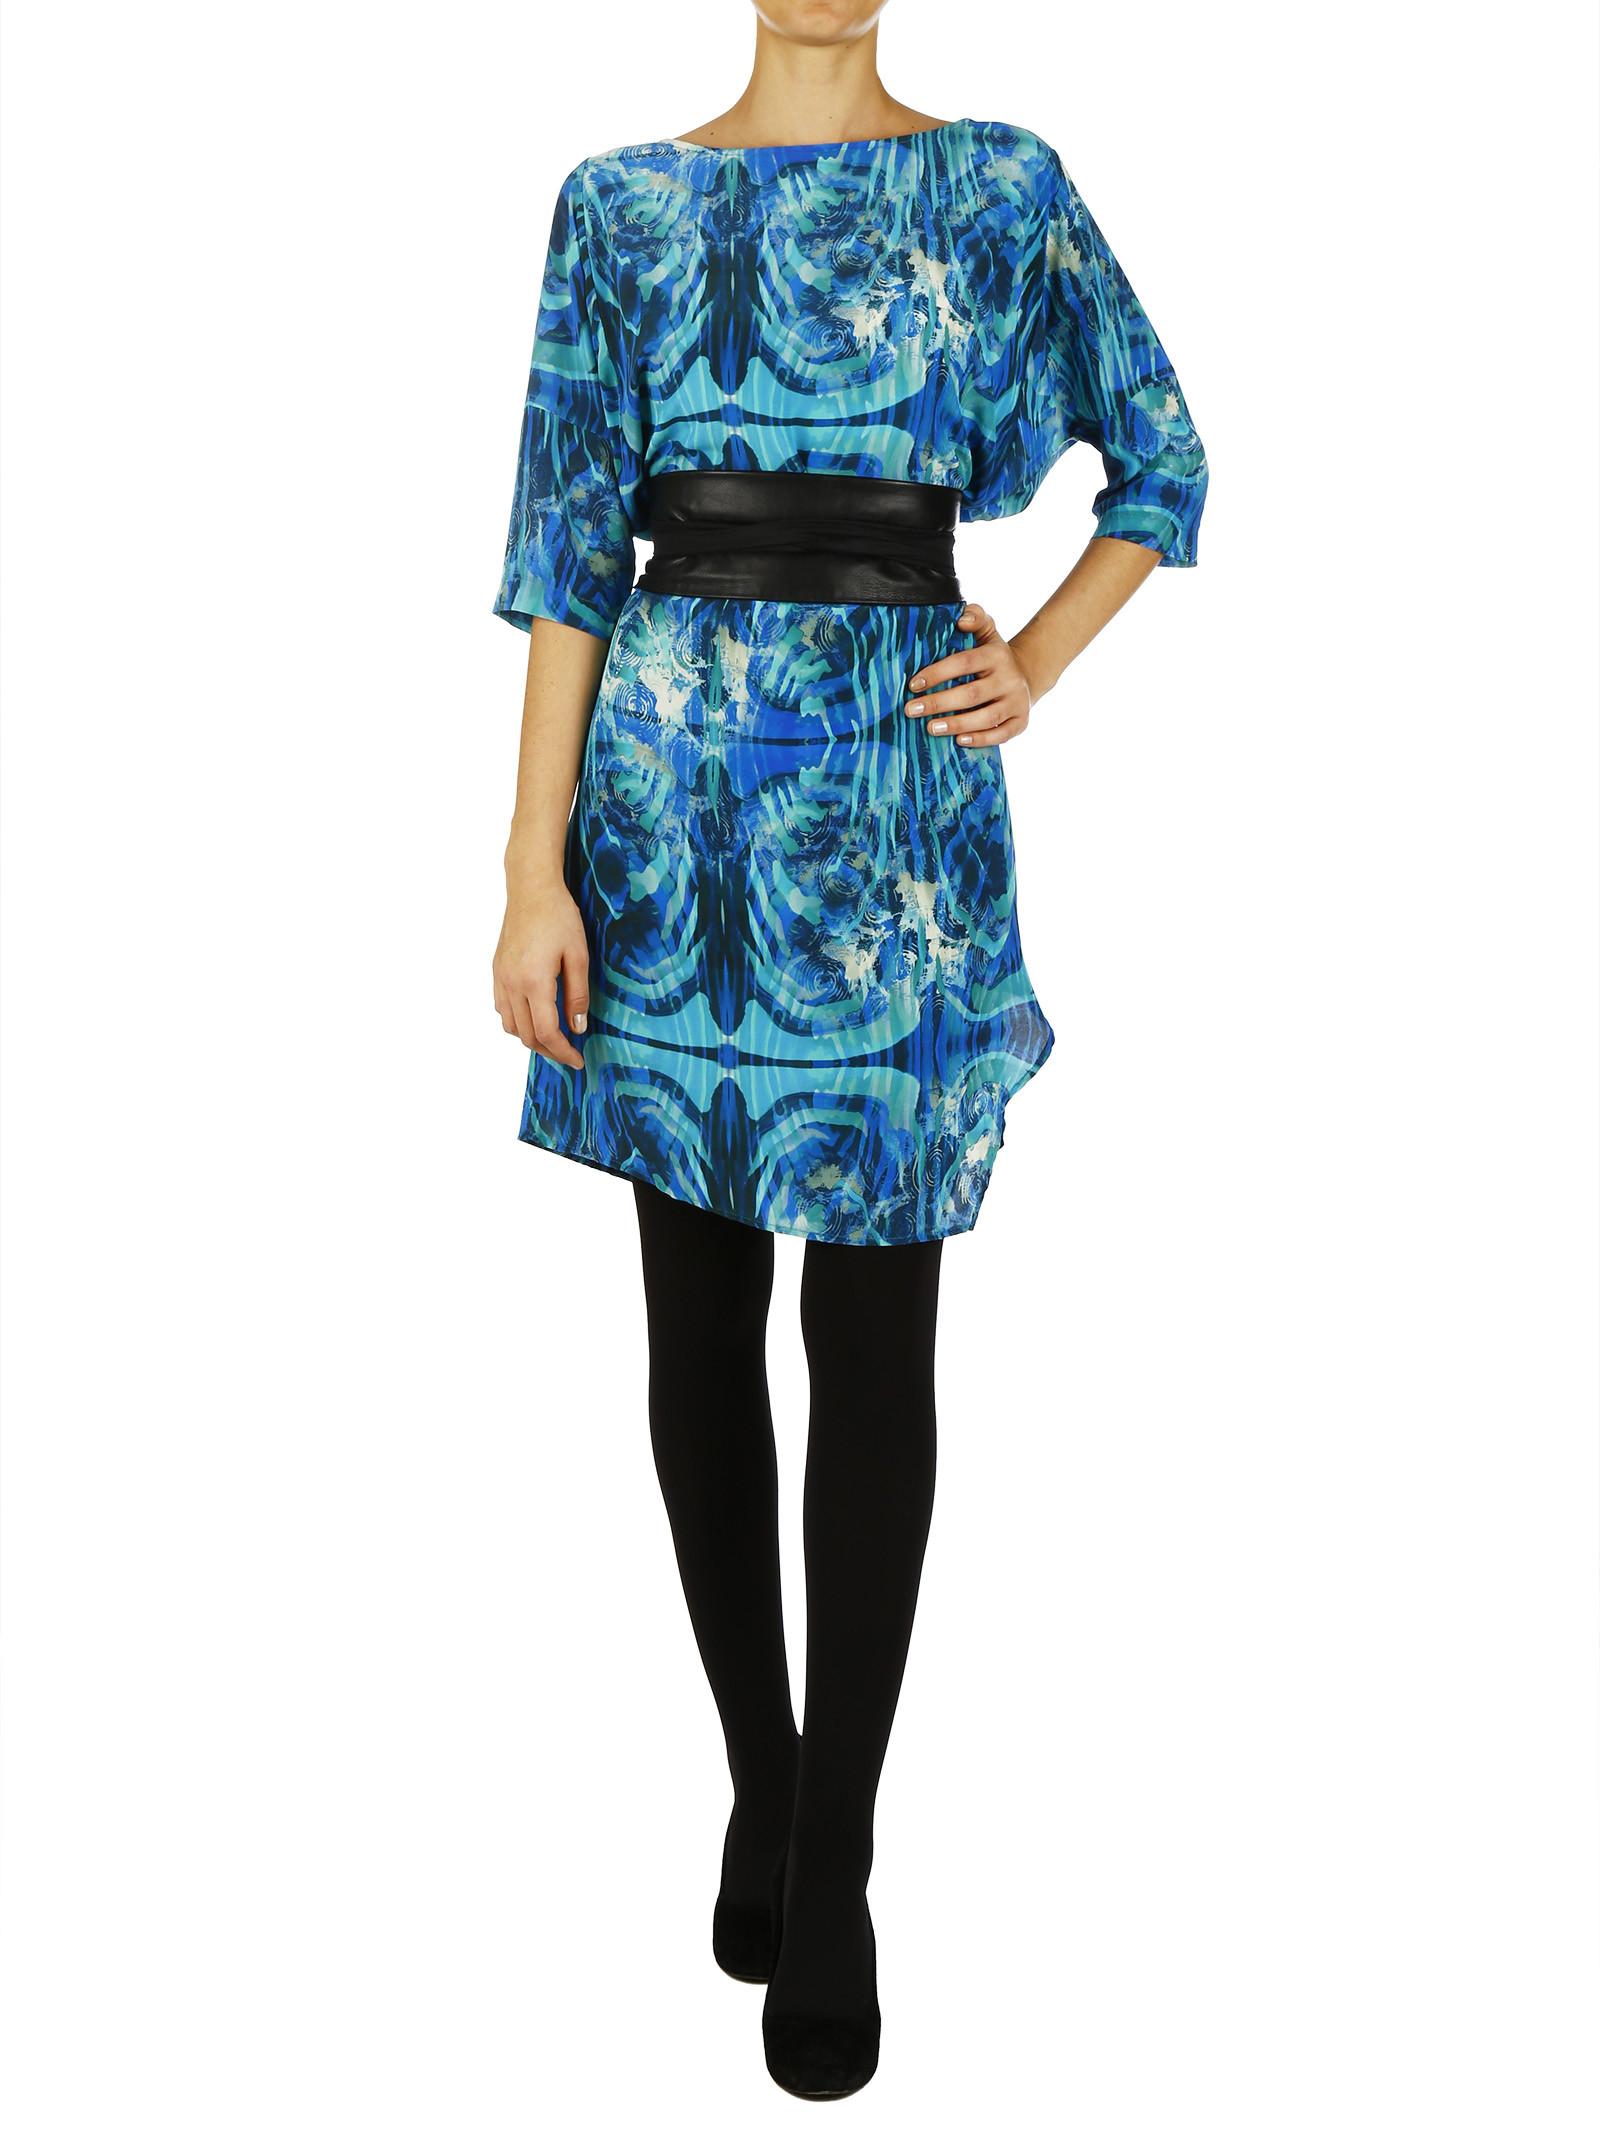 100% Printed Silk Kimono Dress With Lateral Slit